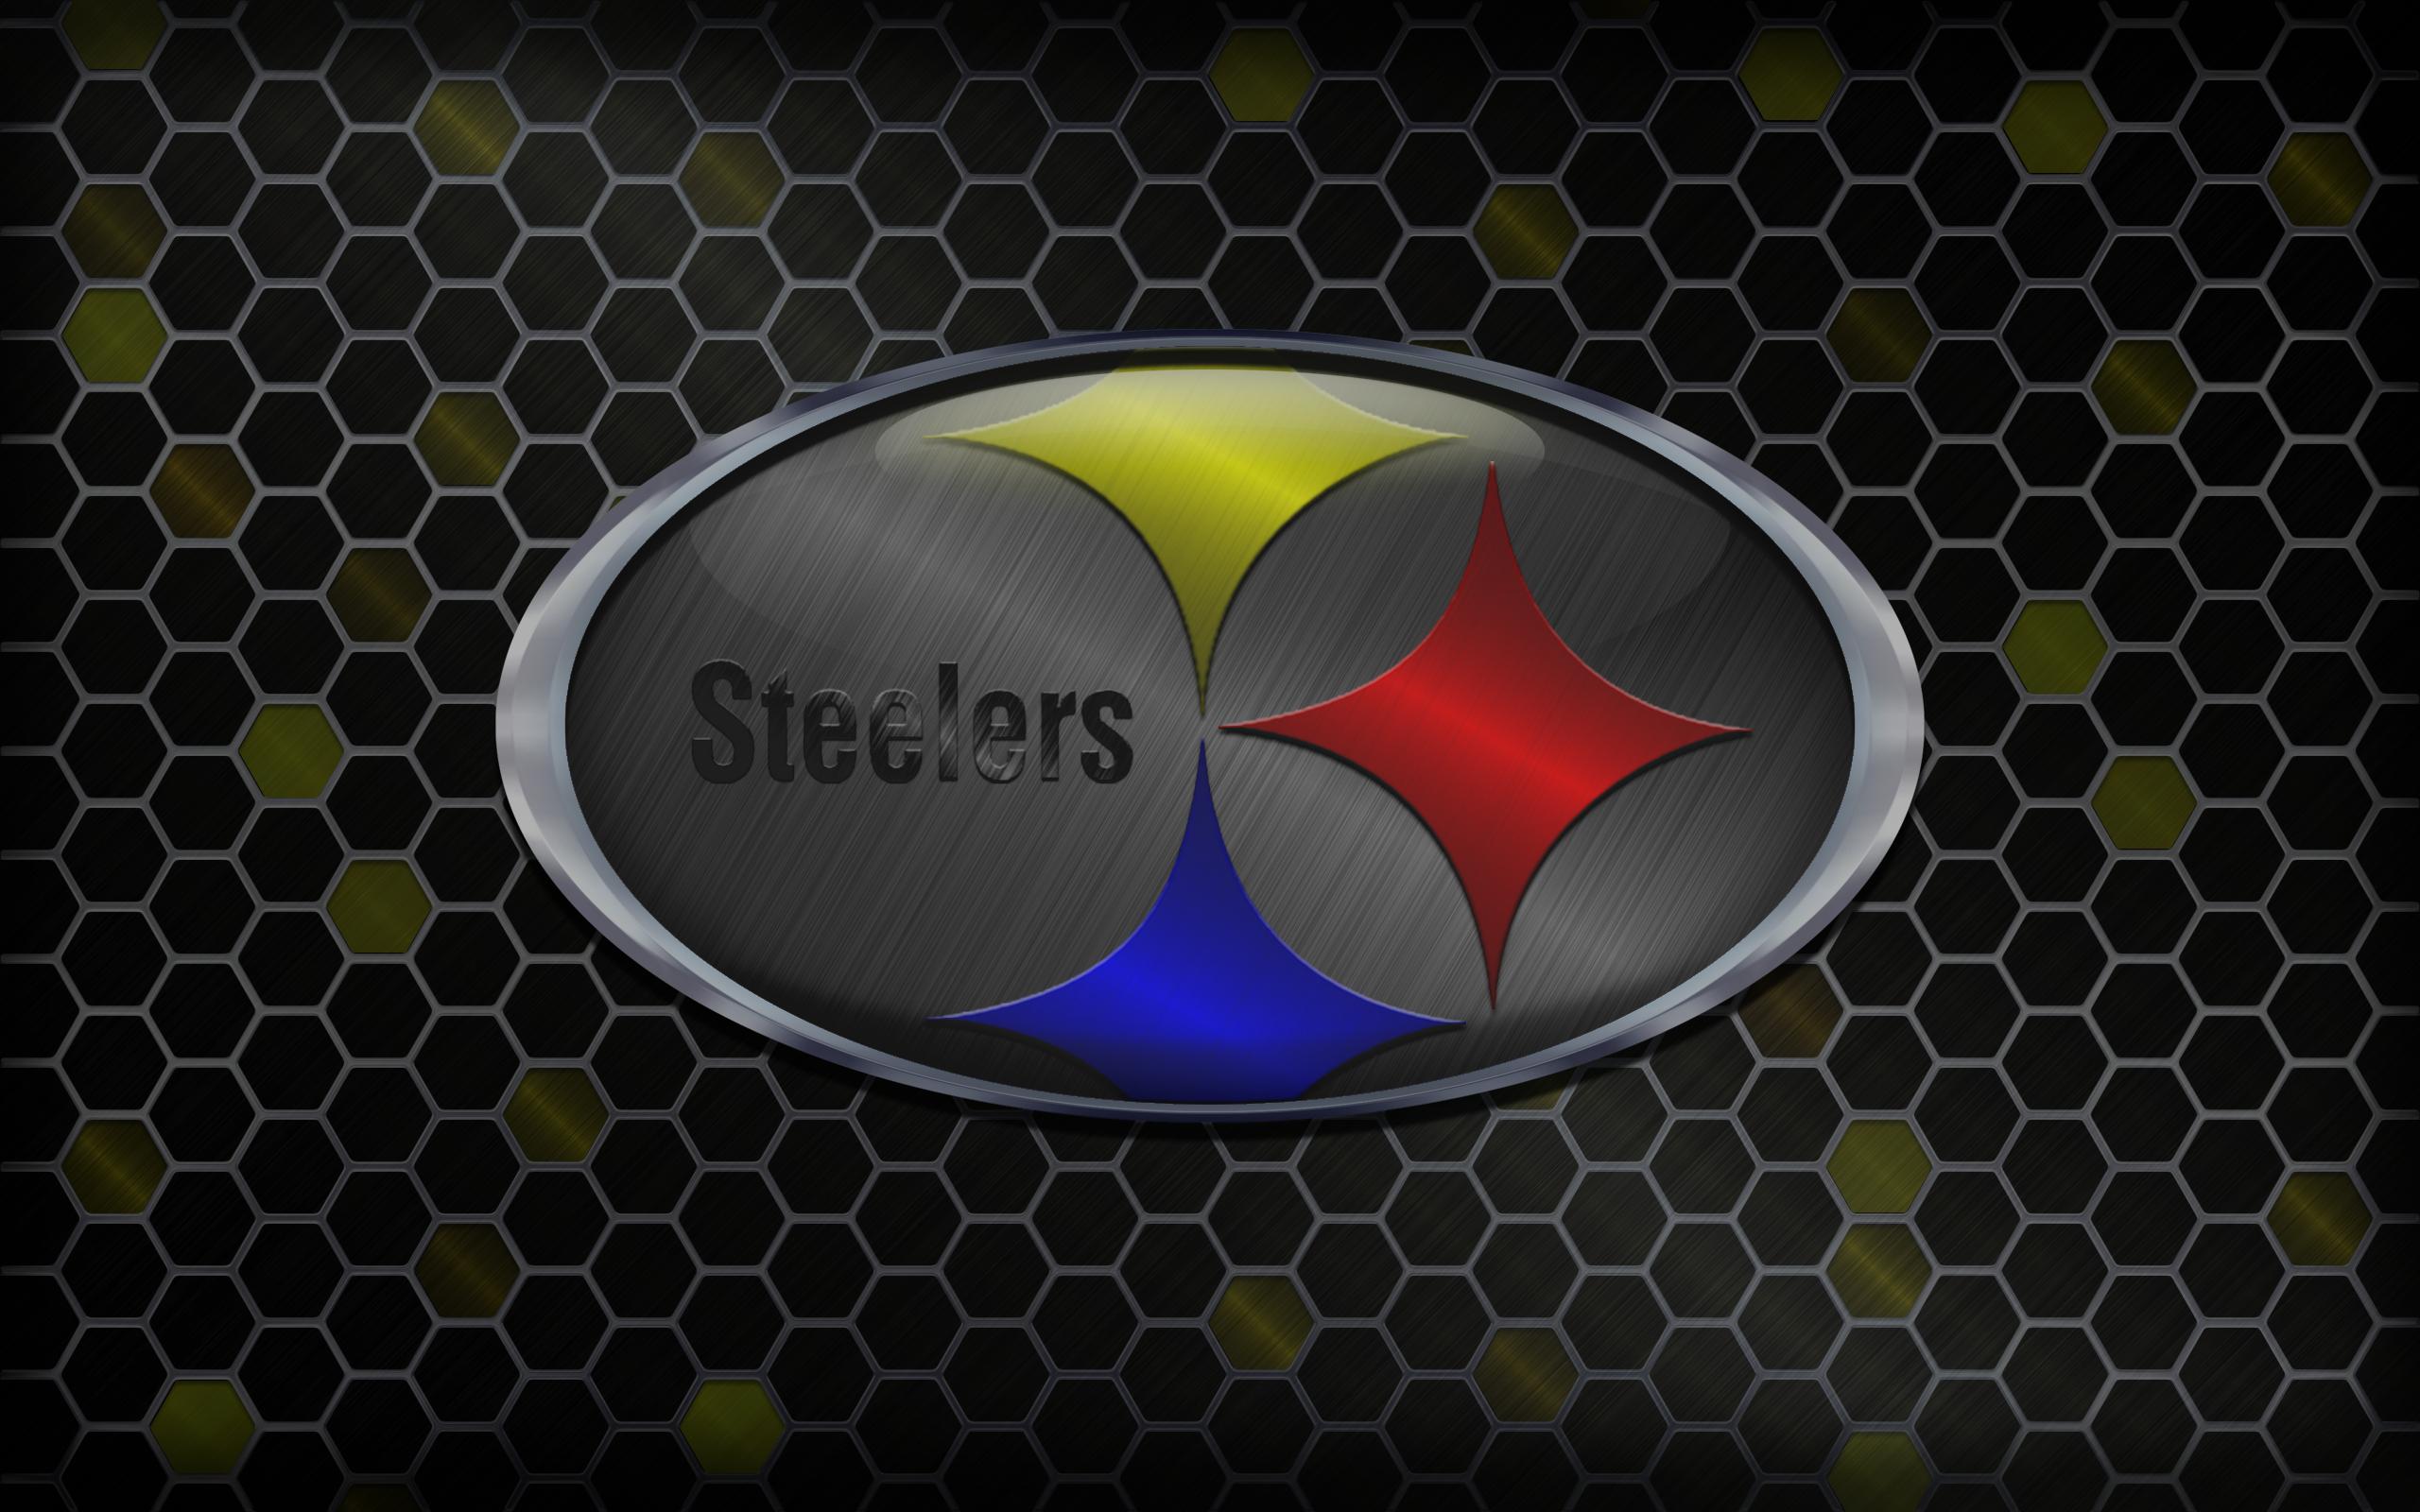 Pittsburgh Steelers wallpaper HD wallpaper 2560x1600